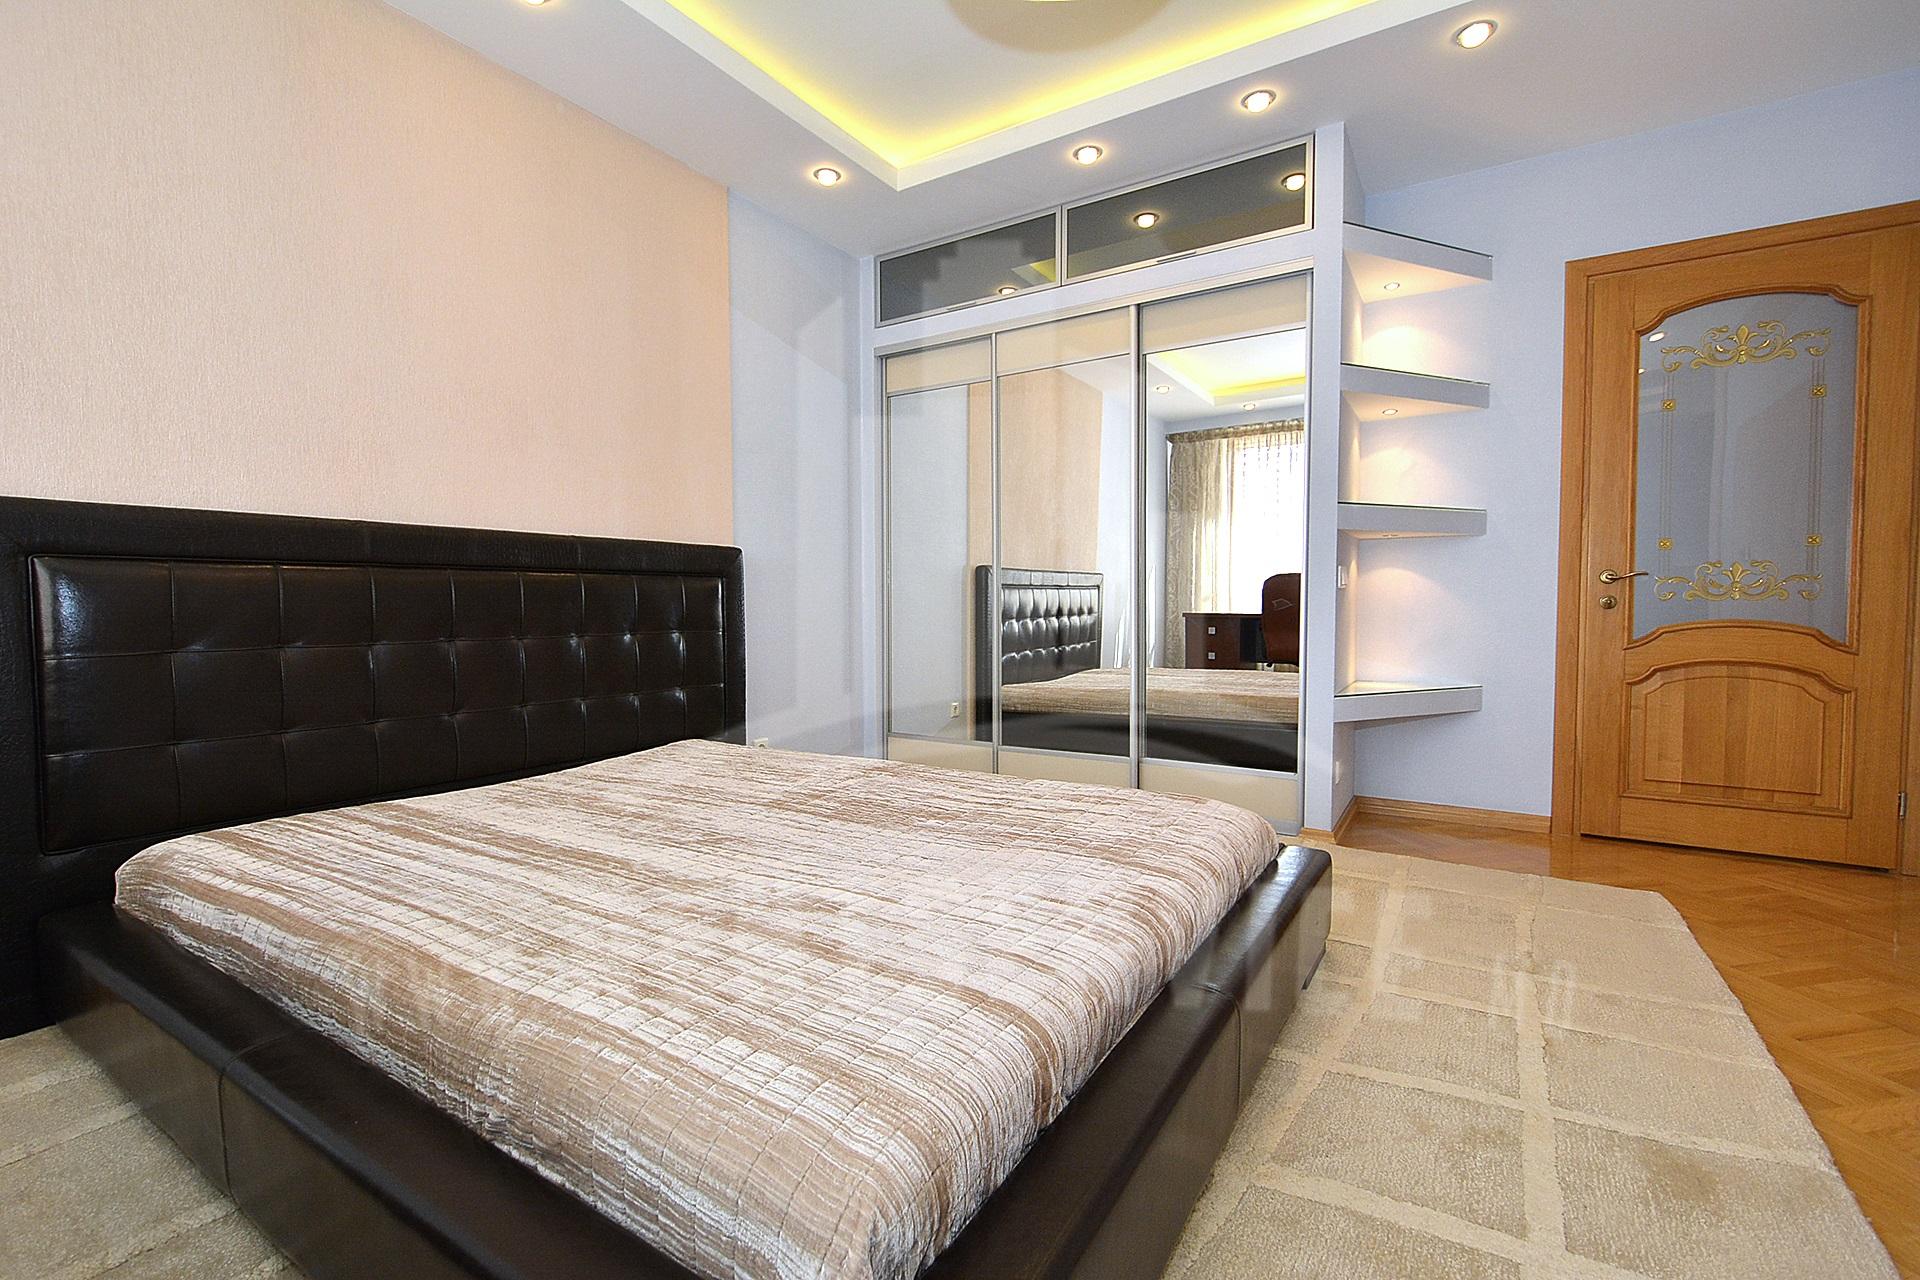 284_apartment_11.JPG